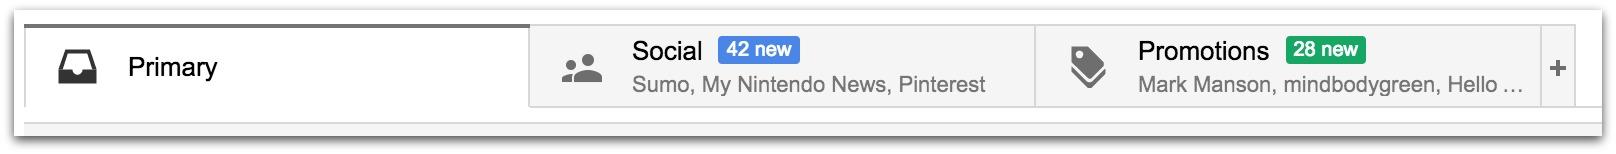 Screenshot showing the inbox folders on Gmail